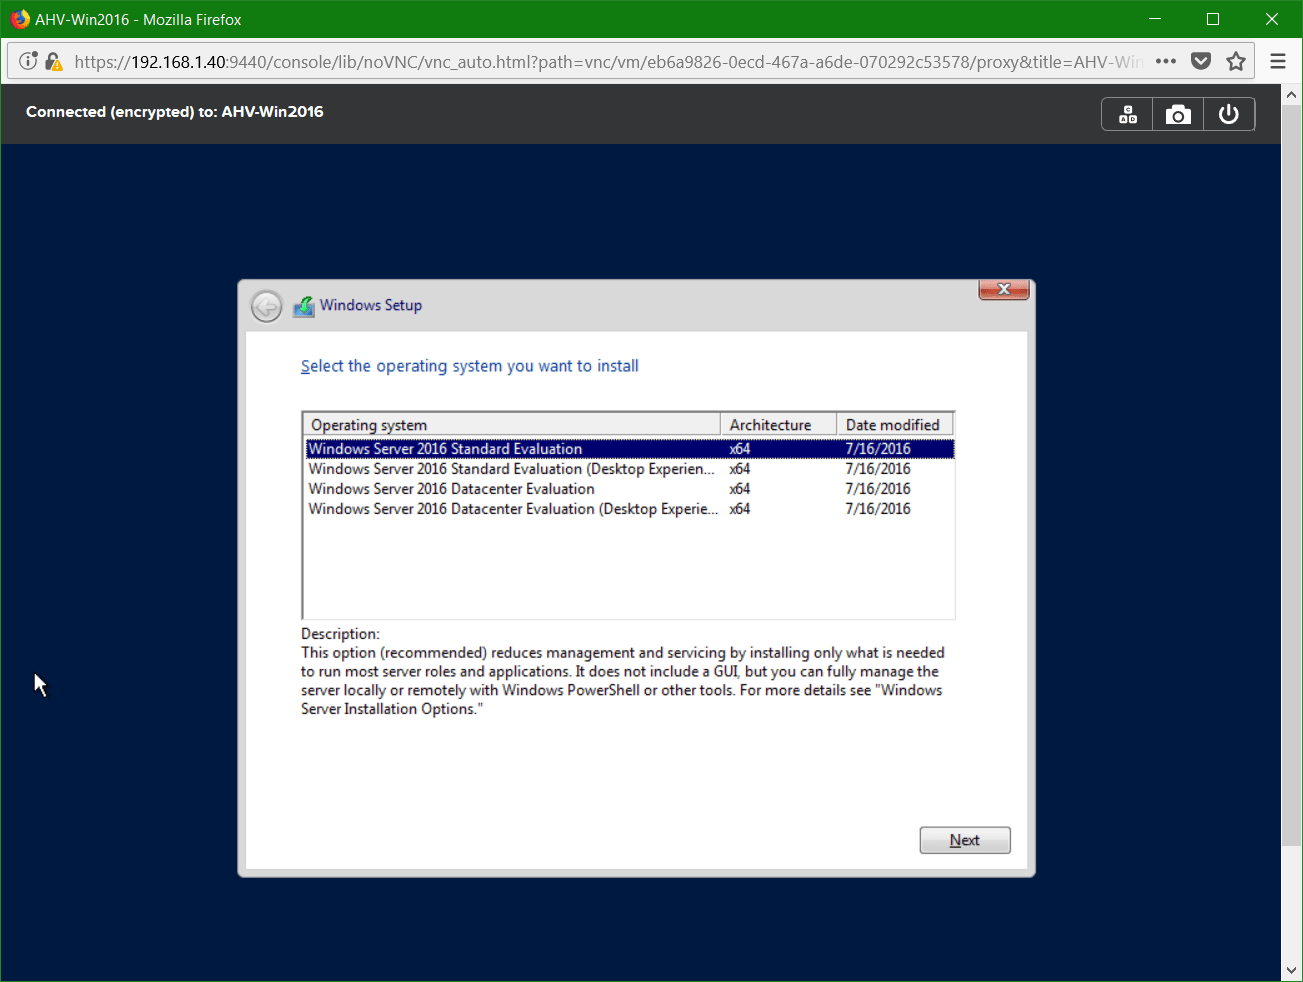 domalab.com Nutanix Windows AHV guest edition